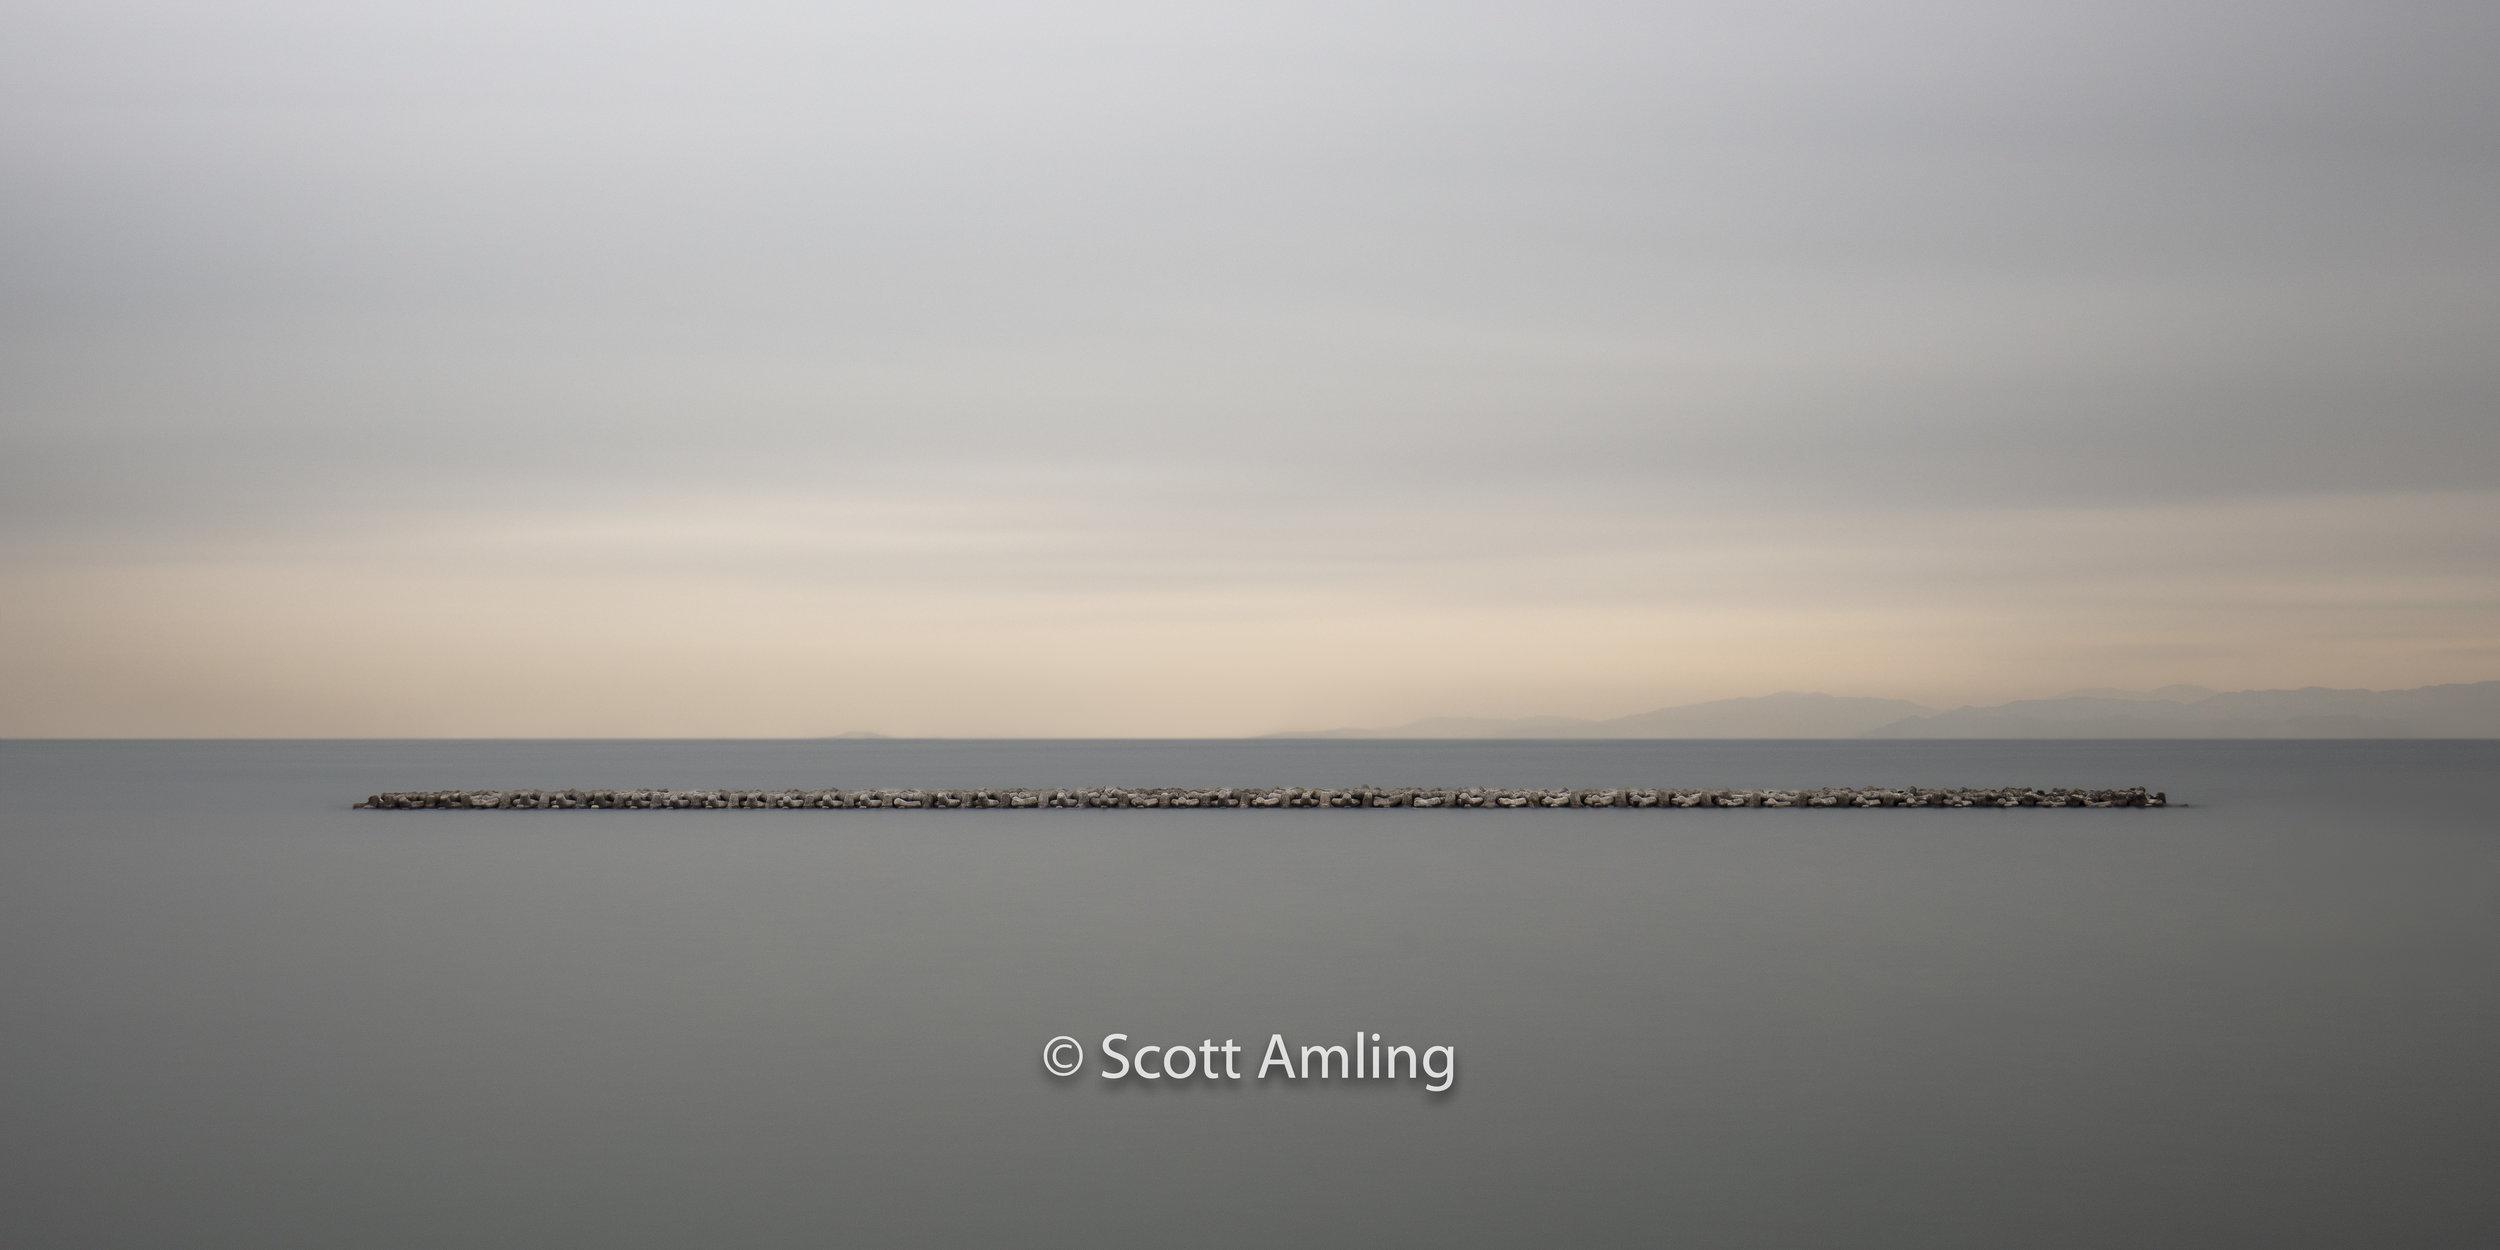 Seawall, Study II